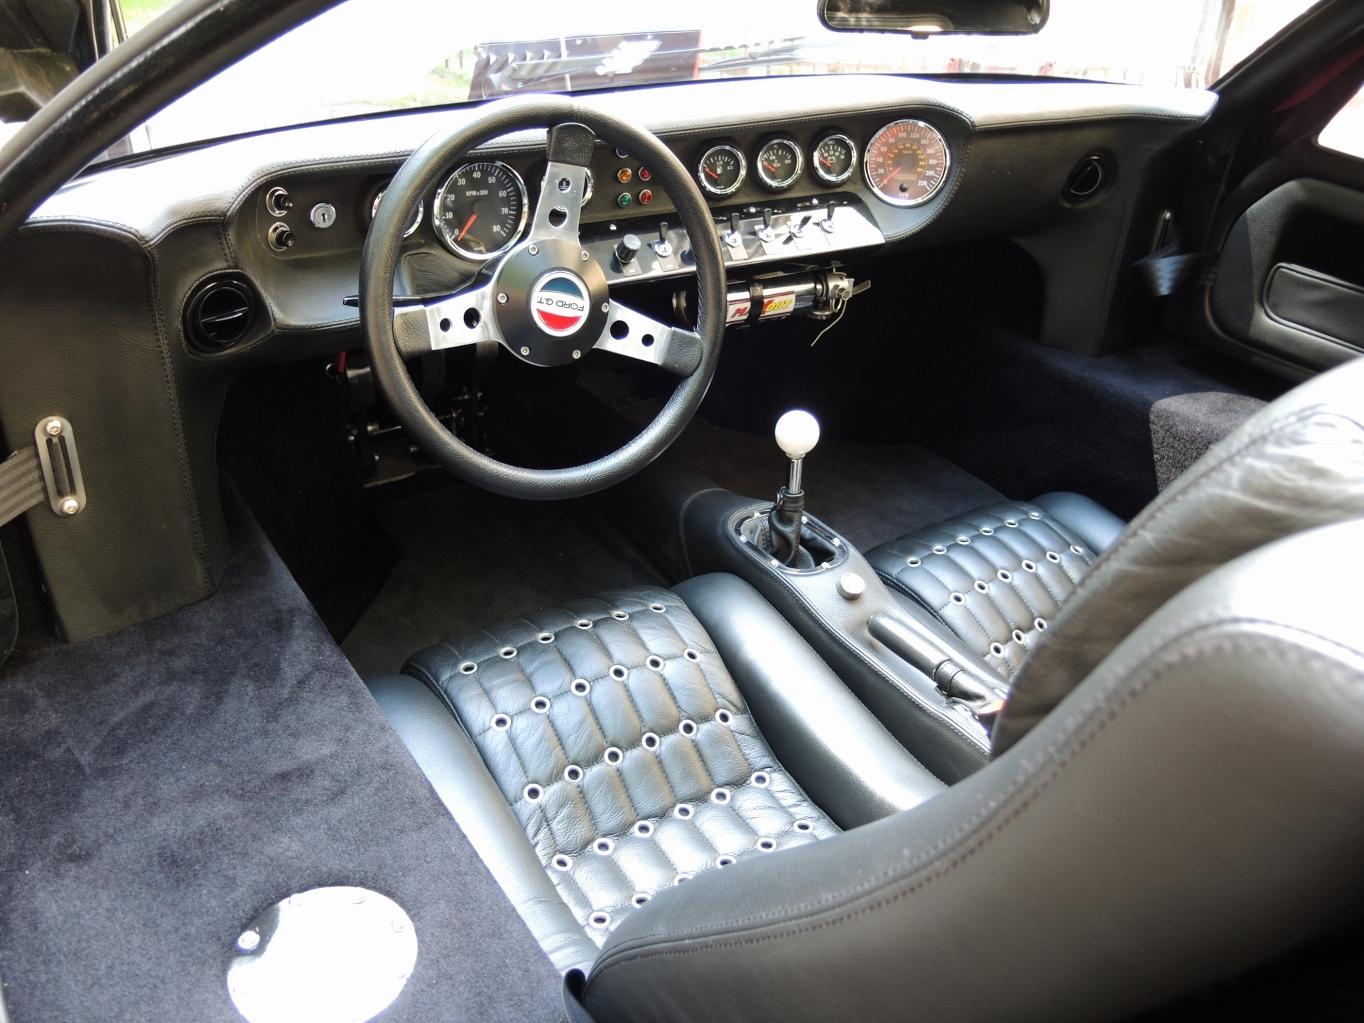 1966 CAV GT For Sale **SOLD**-interior-1-1920x1440-1364x1023-jpg